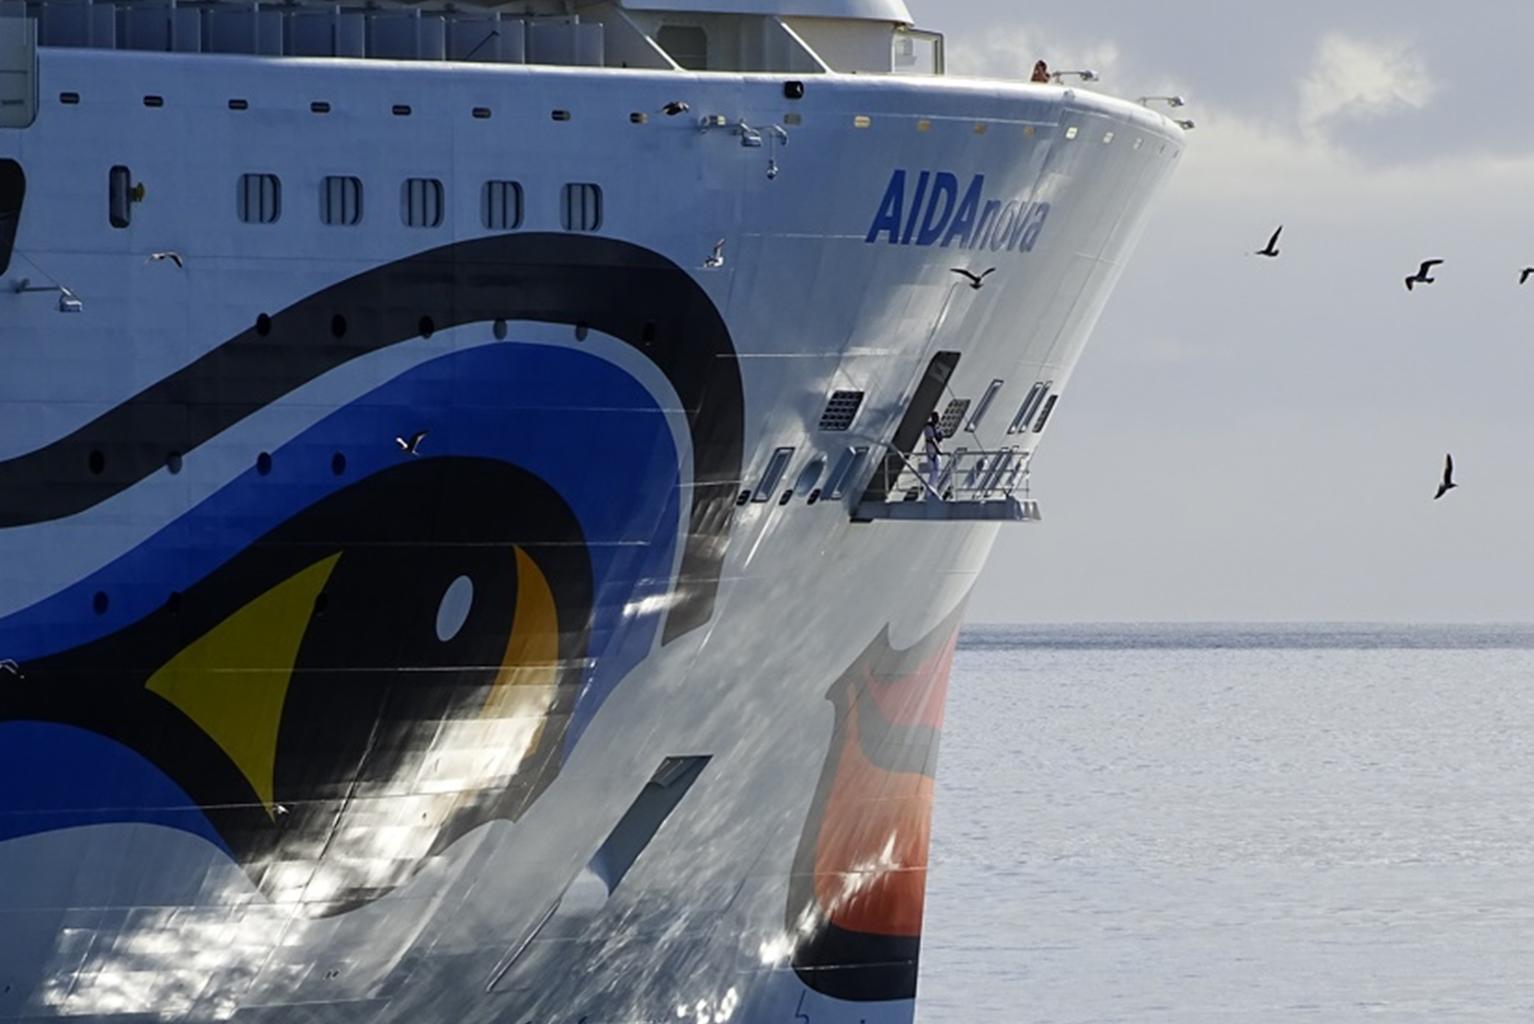 AIDA Announces 2020 and 2020-2021 Cruise Programs